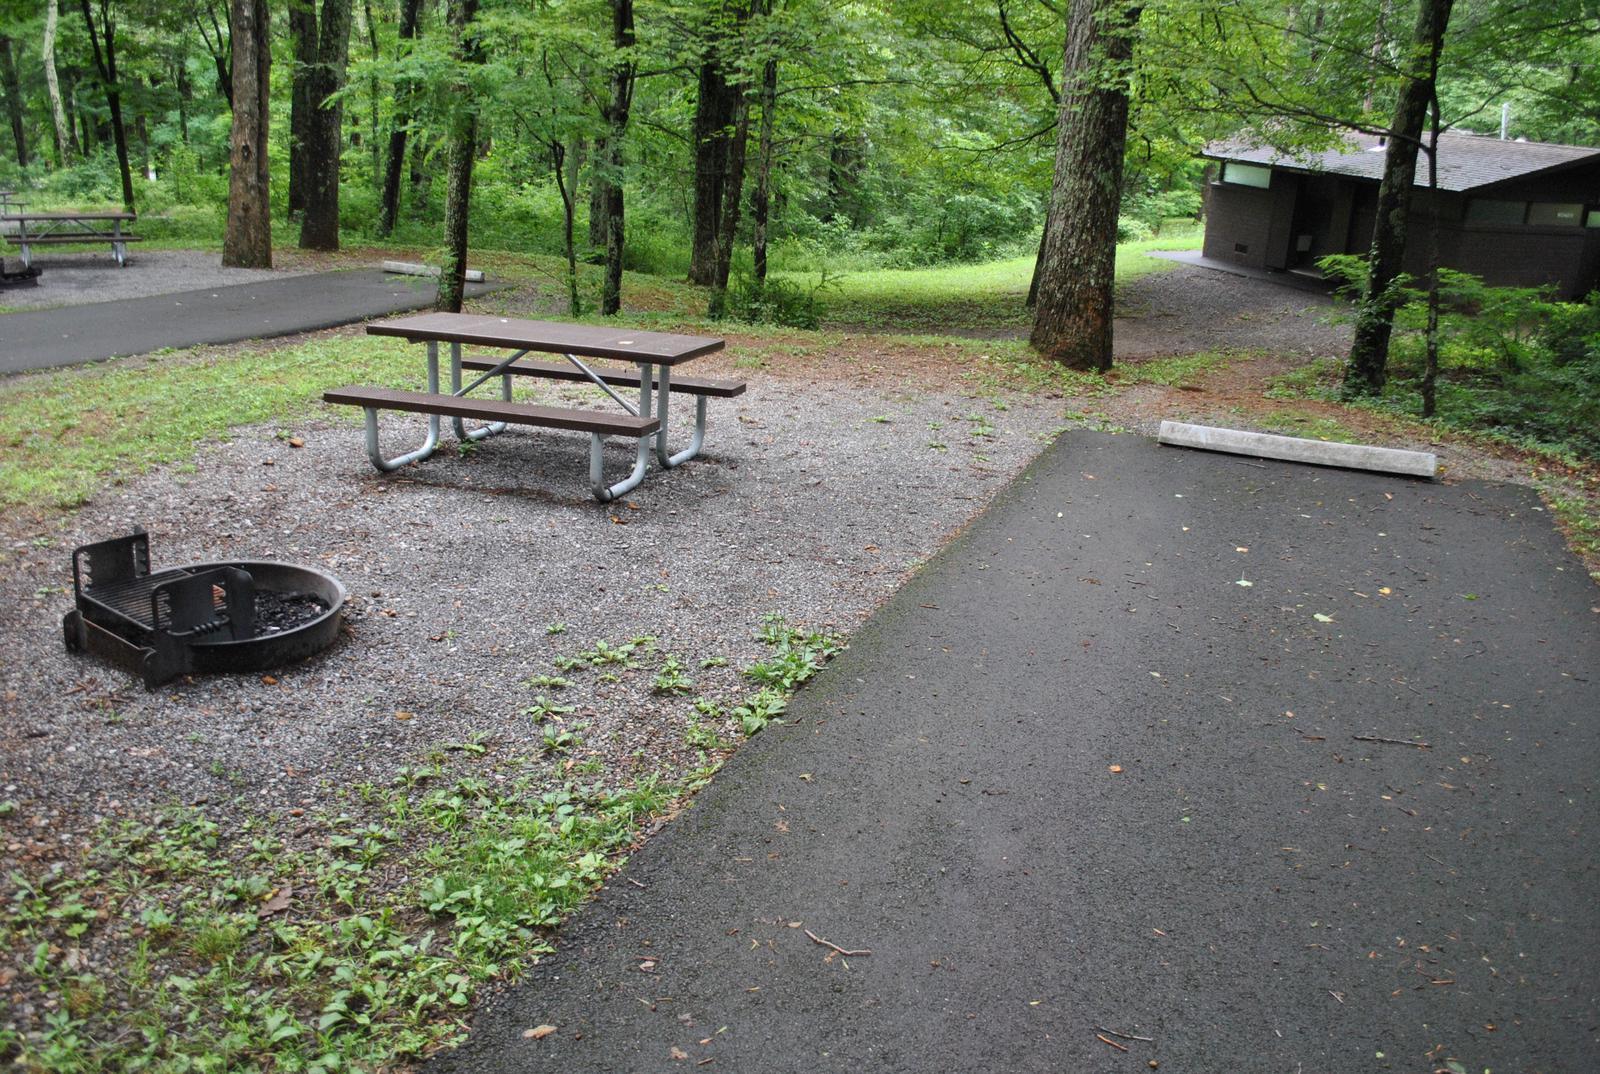 Mathews Arm Campground – Site A008